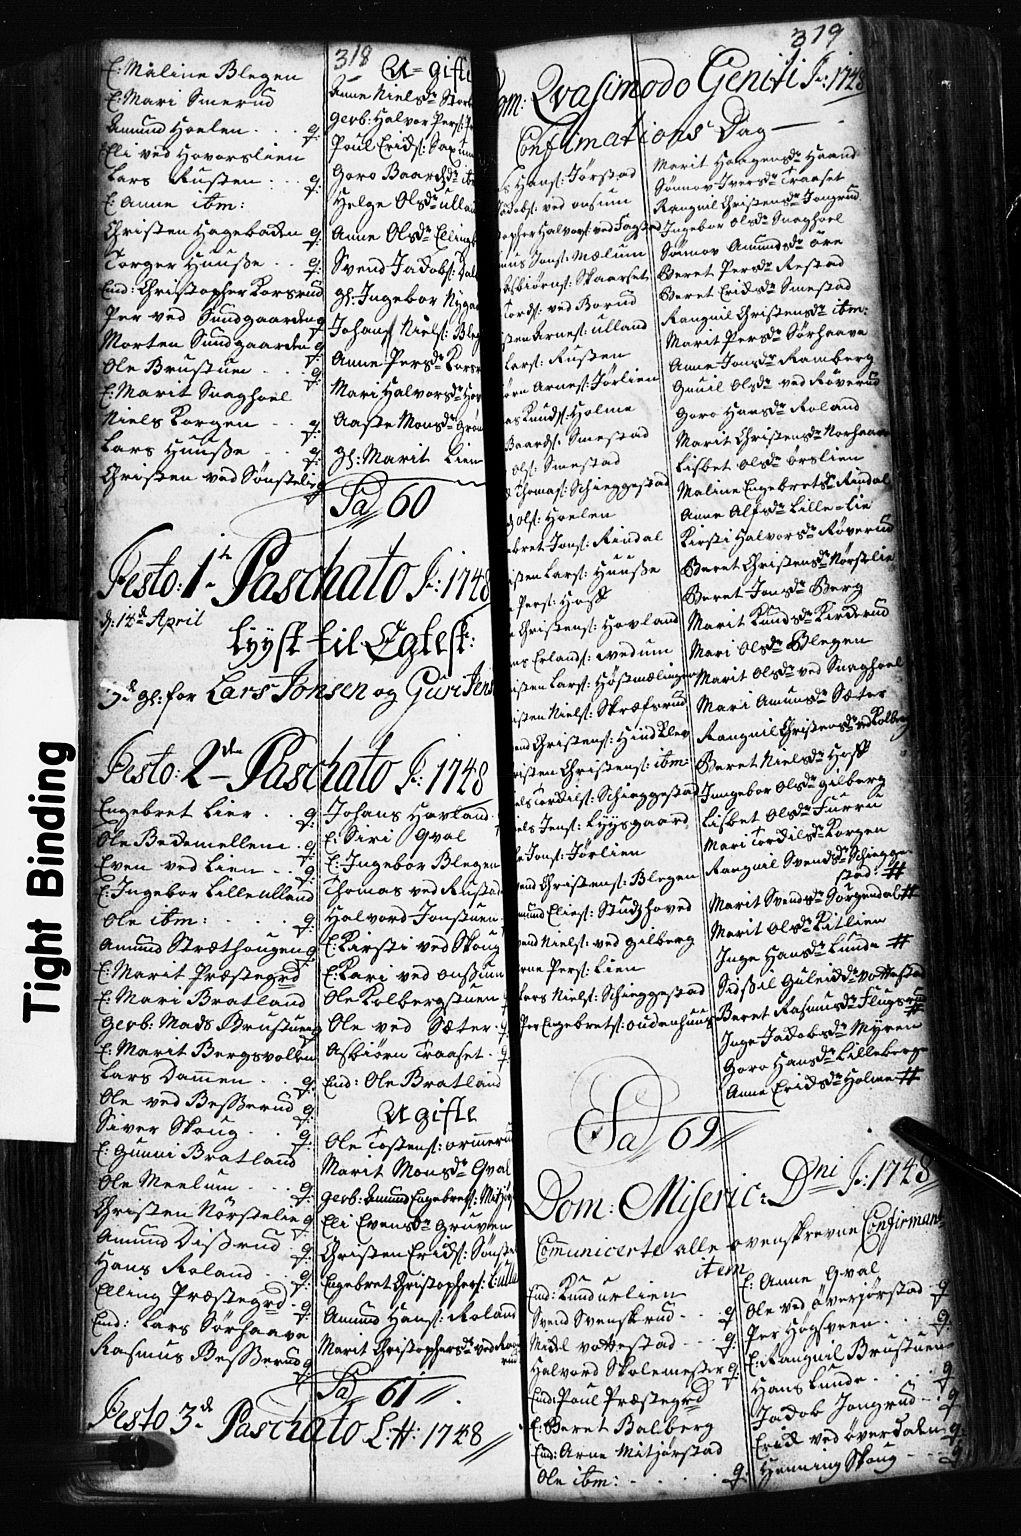 SAH, Fåberg prestekontor, Klokkerbok nr. 2, 1741-1756, s. 318-319